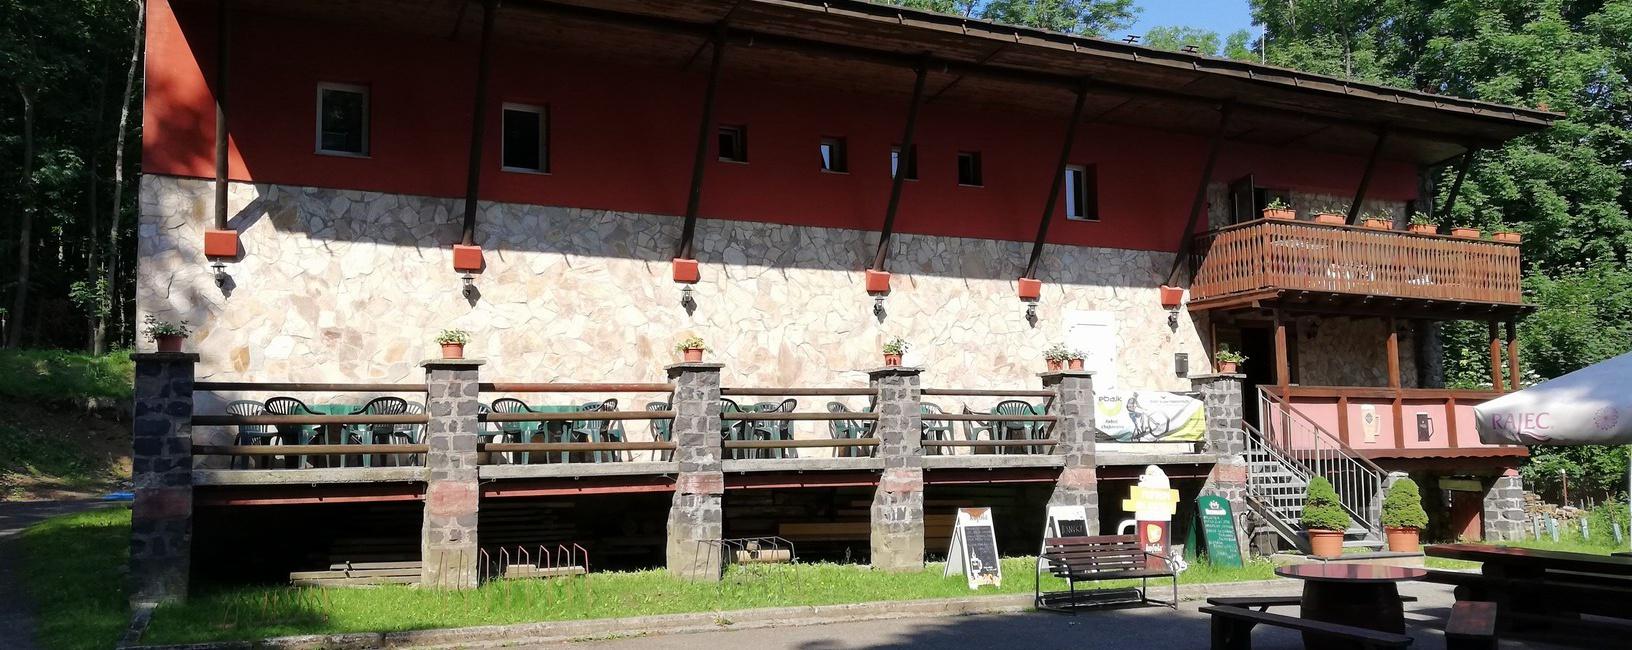 Chata Korenný vrch